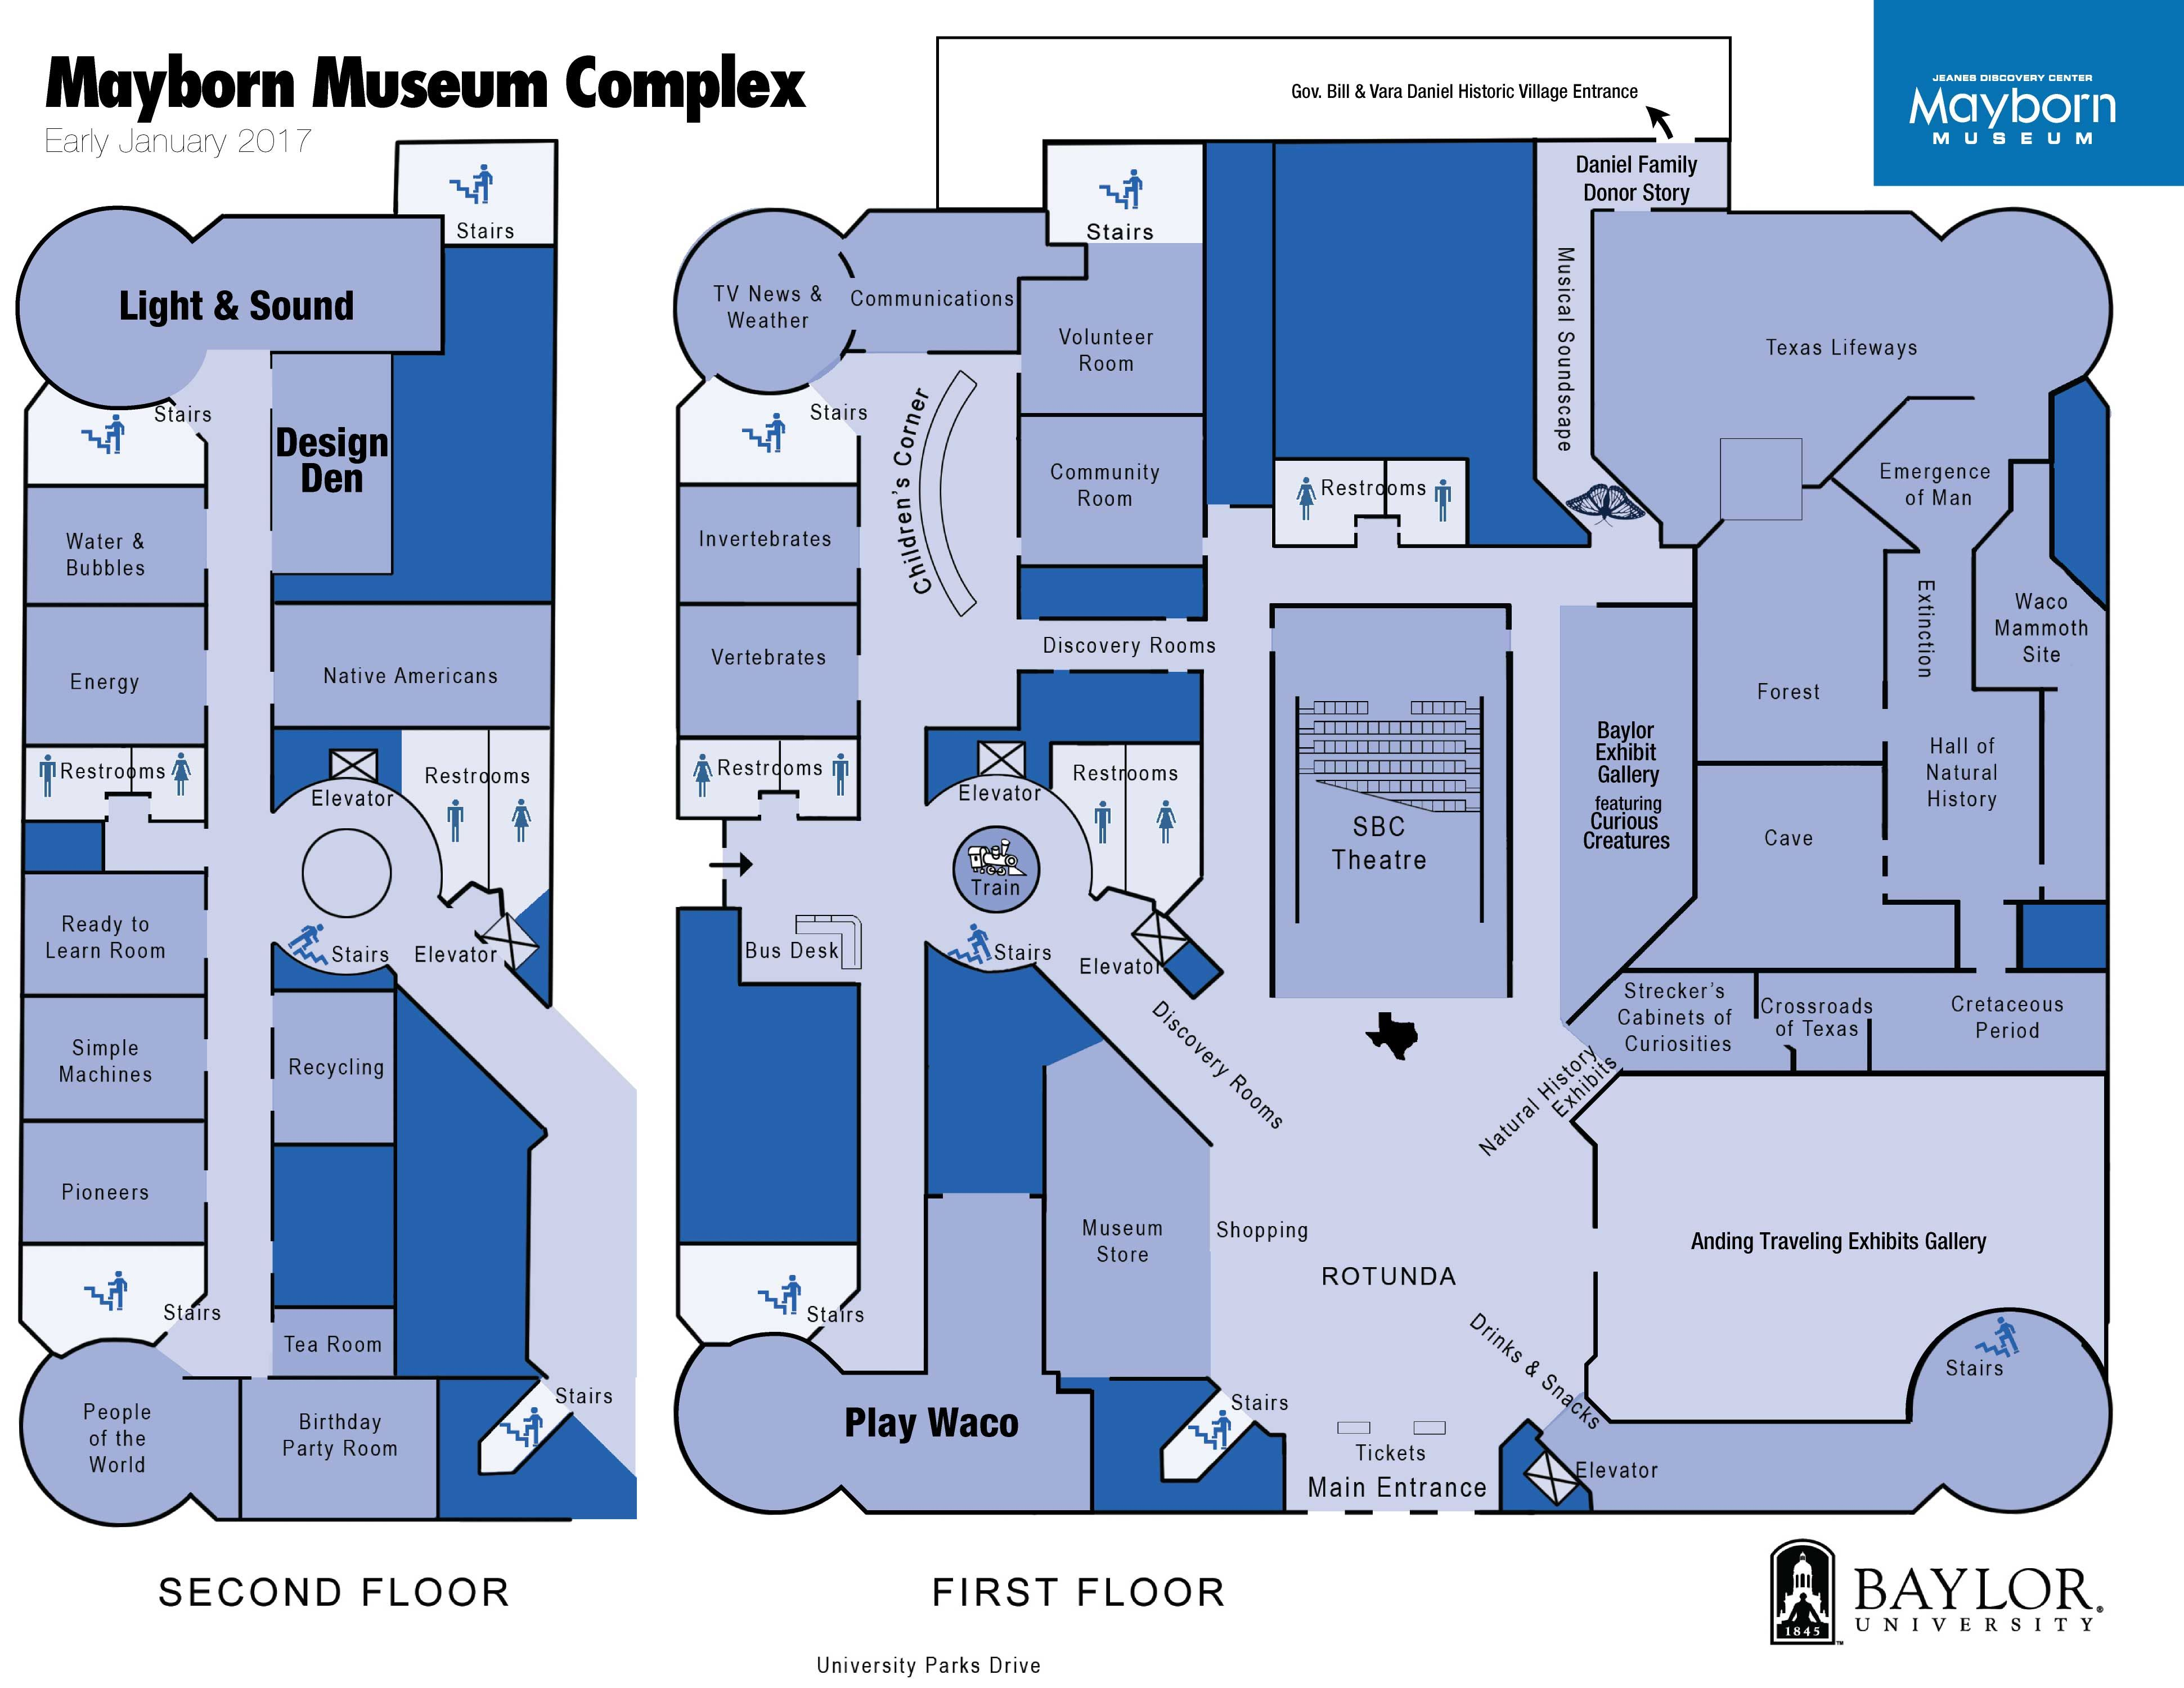 Mayborn Museum Complex Map